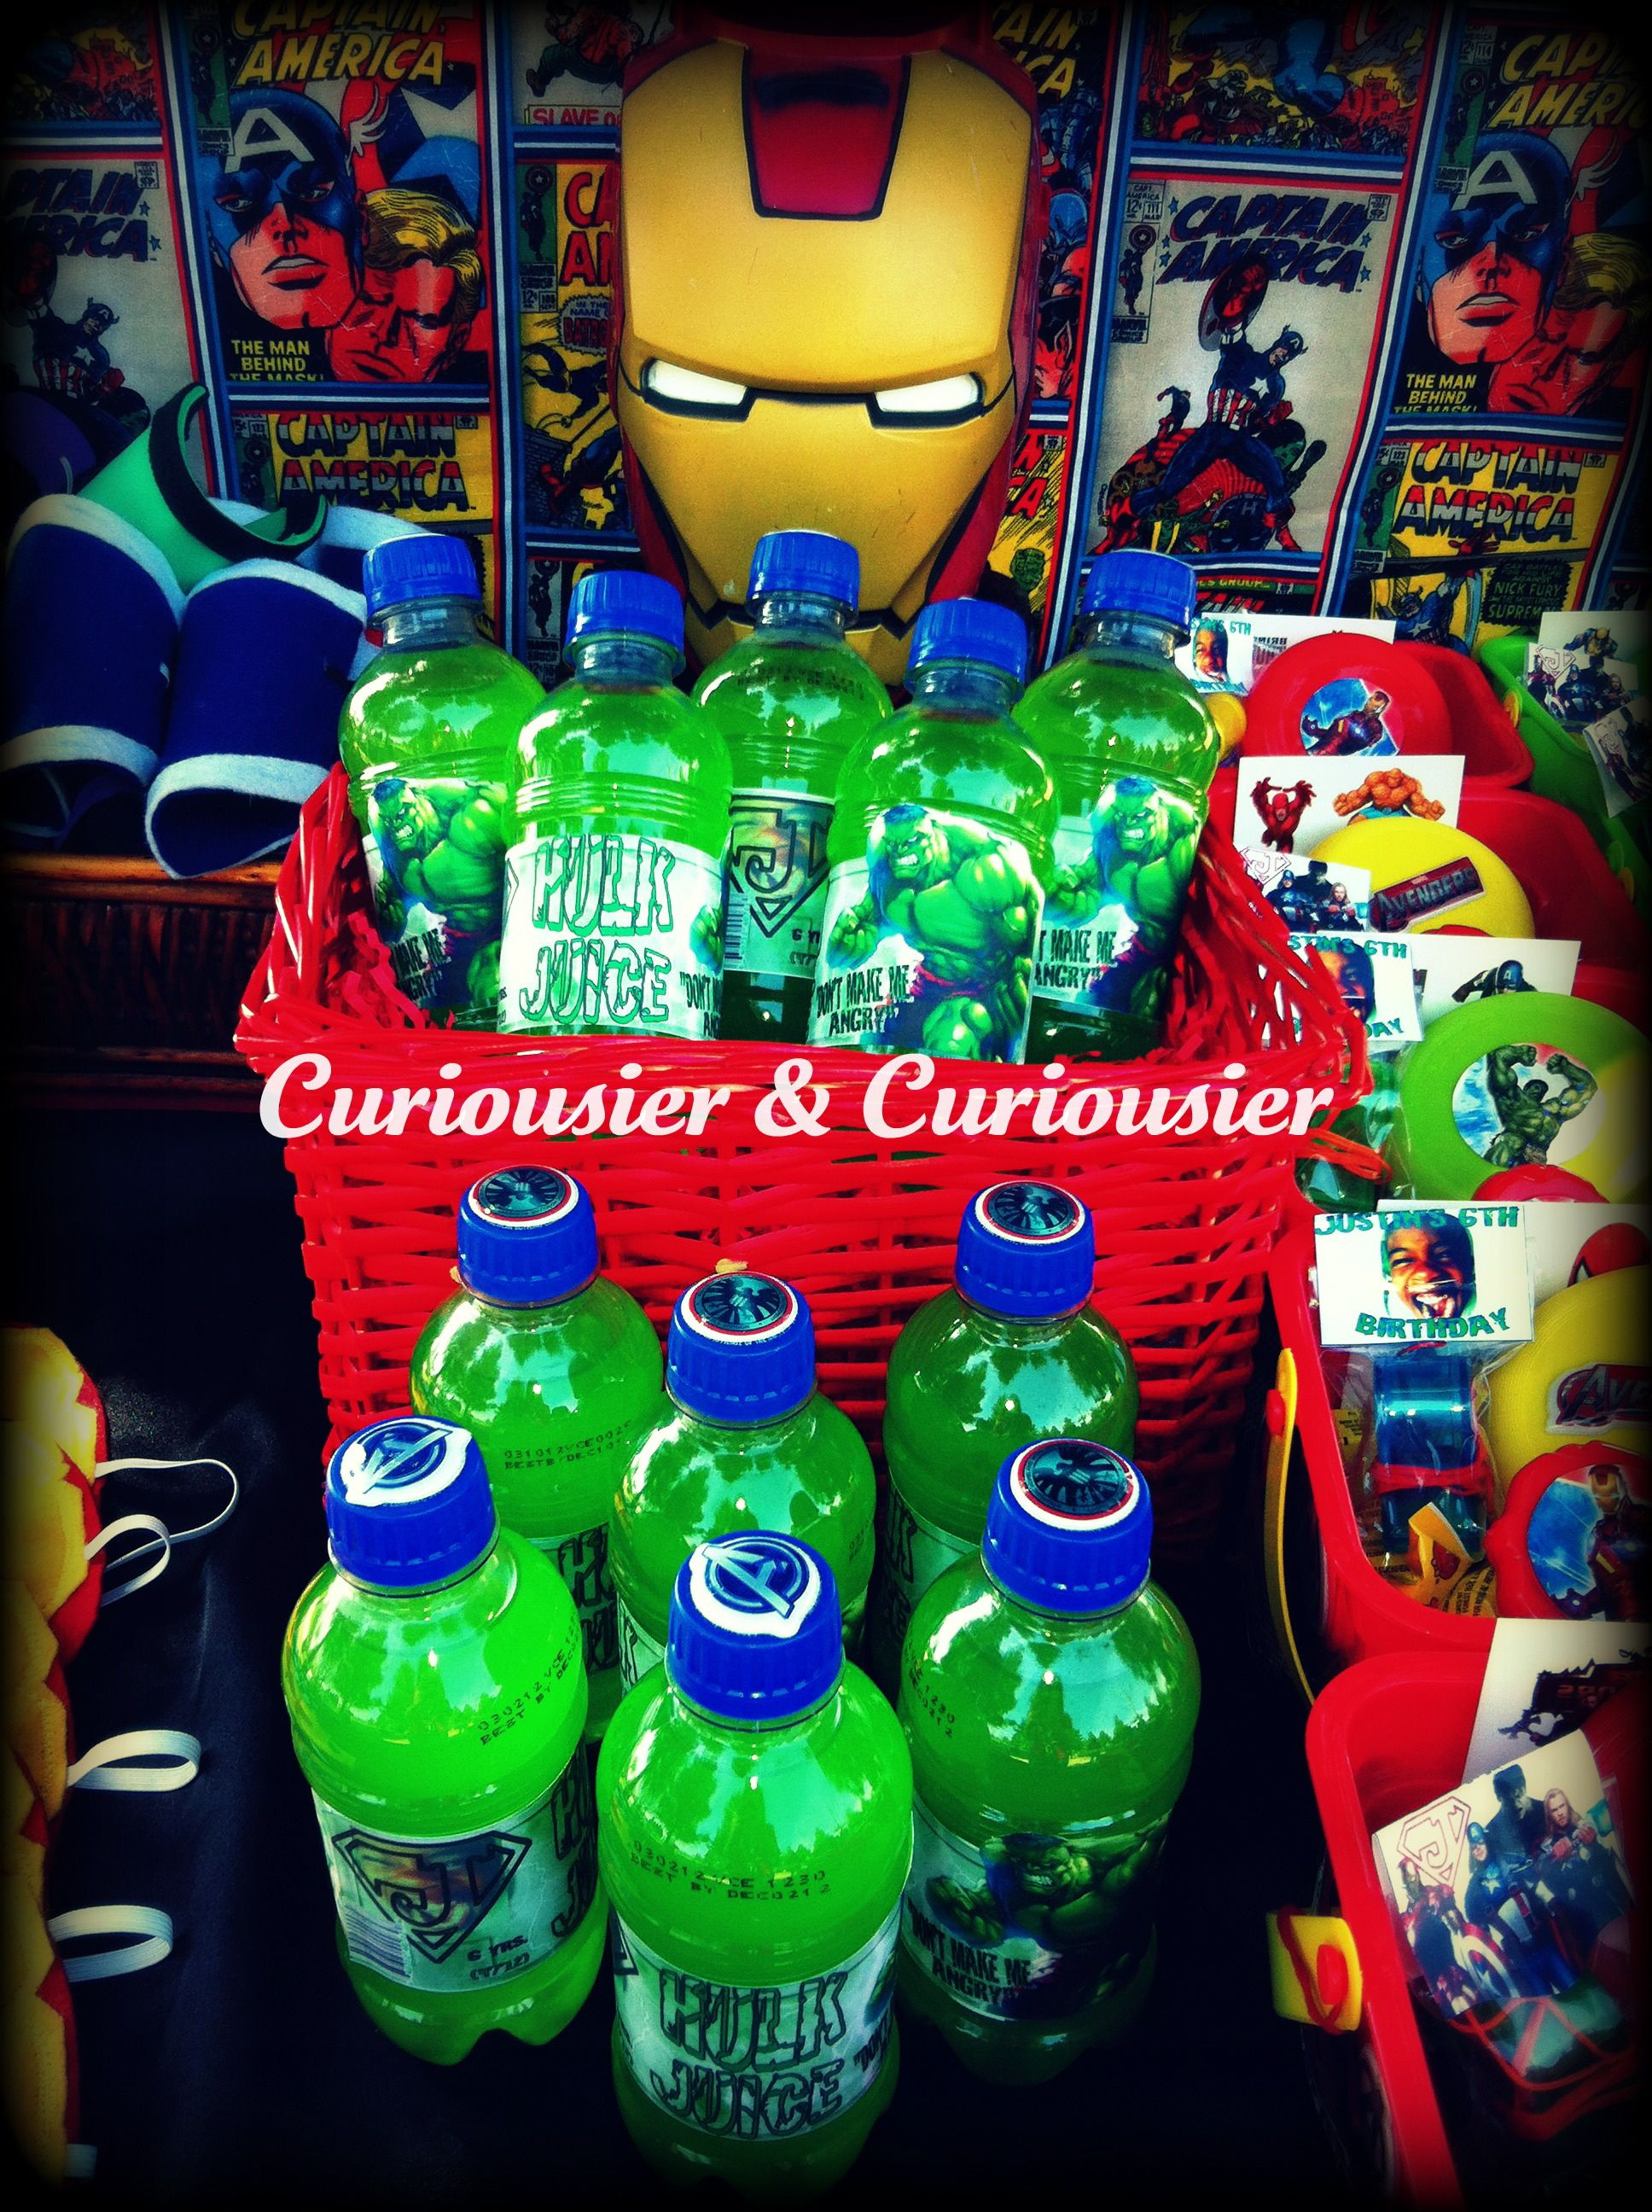 AVENGER BIRTHDAY PARTY DECOR  Captain America  Hulk    Iron Man. AVENGER BIRTHDAY PARTY DECOR  Captain America  Hulk    Iron Man